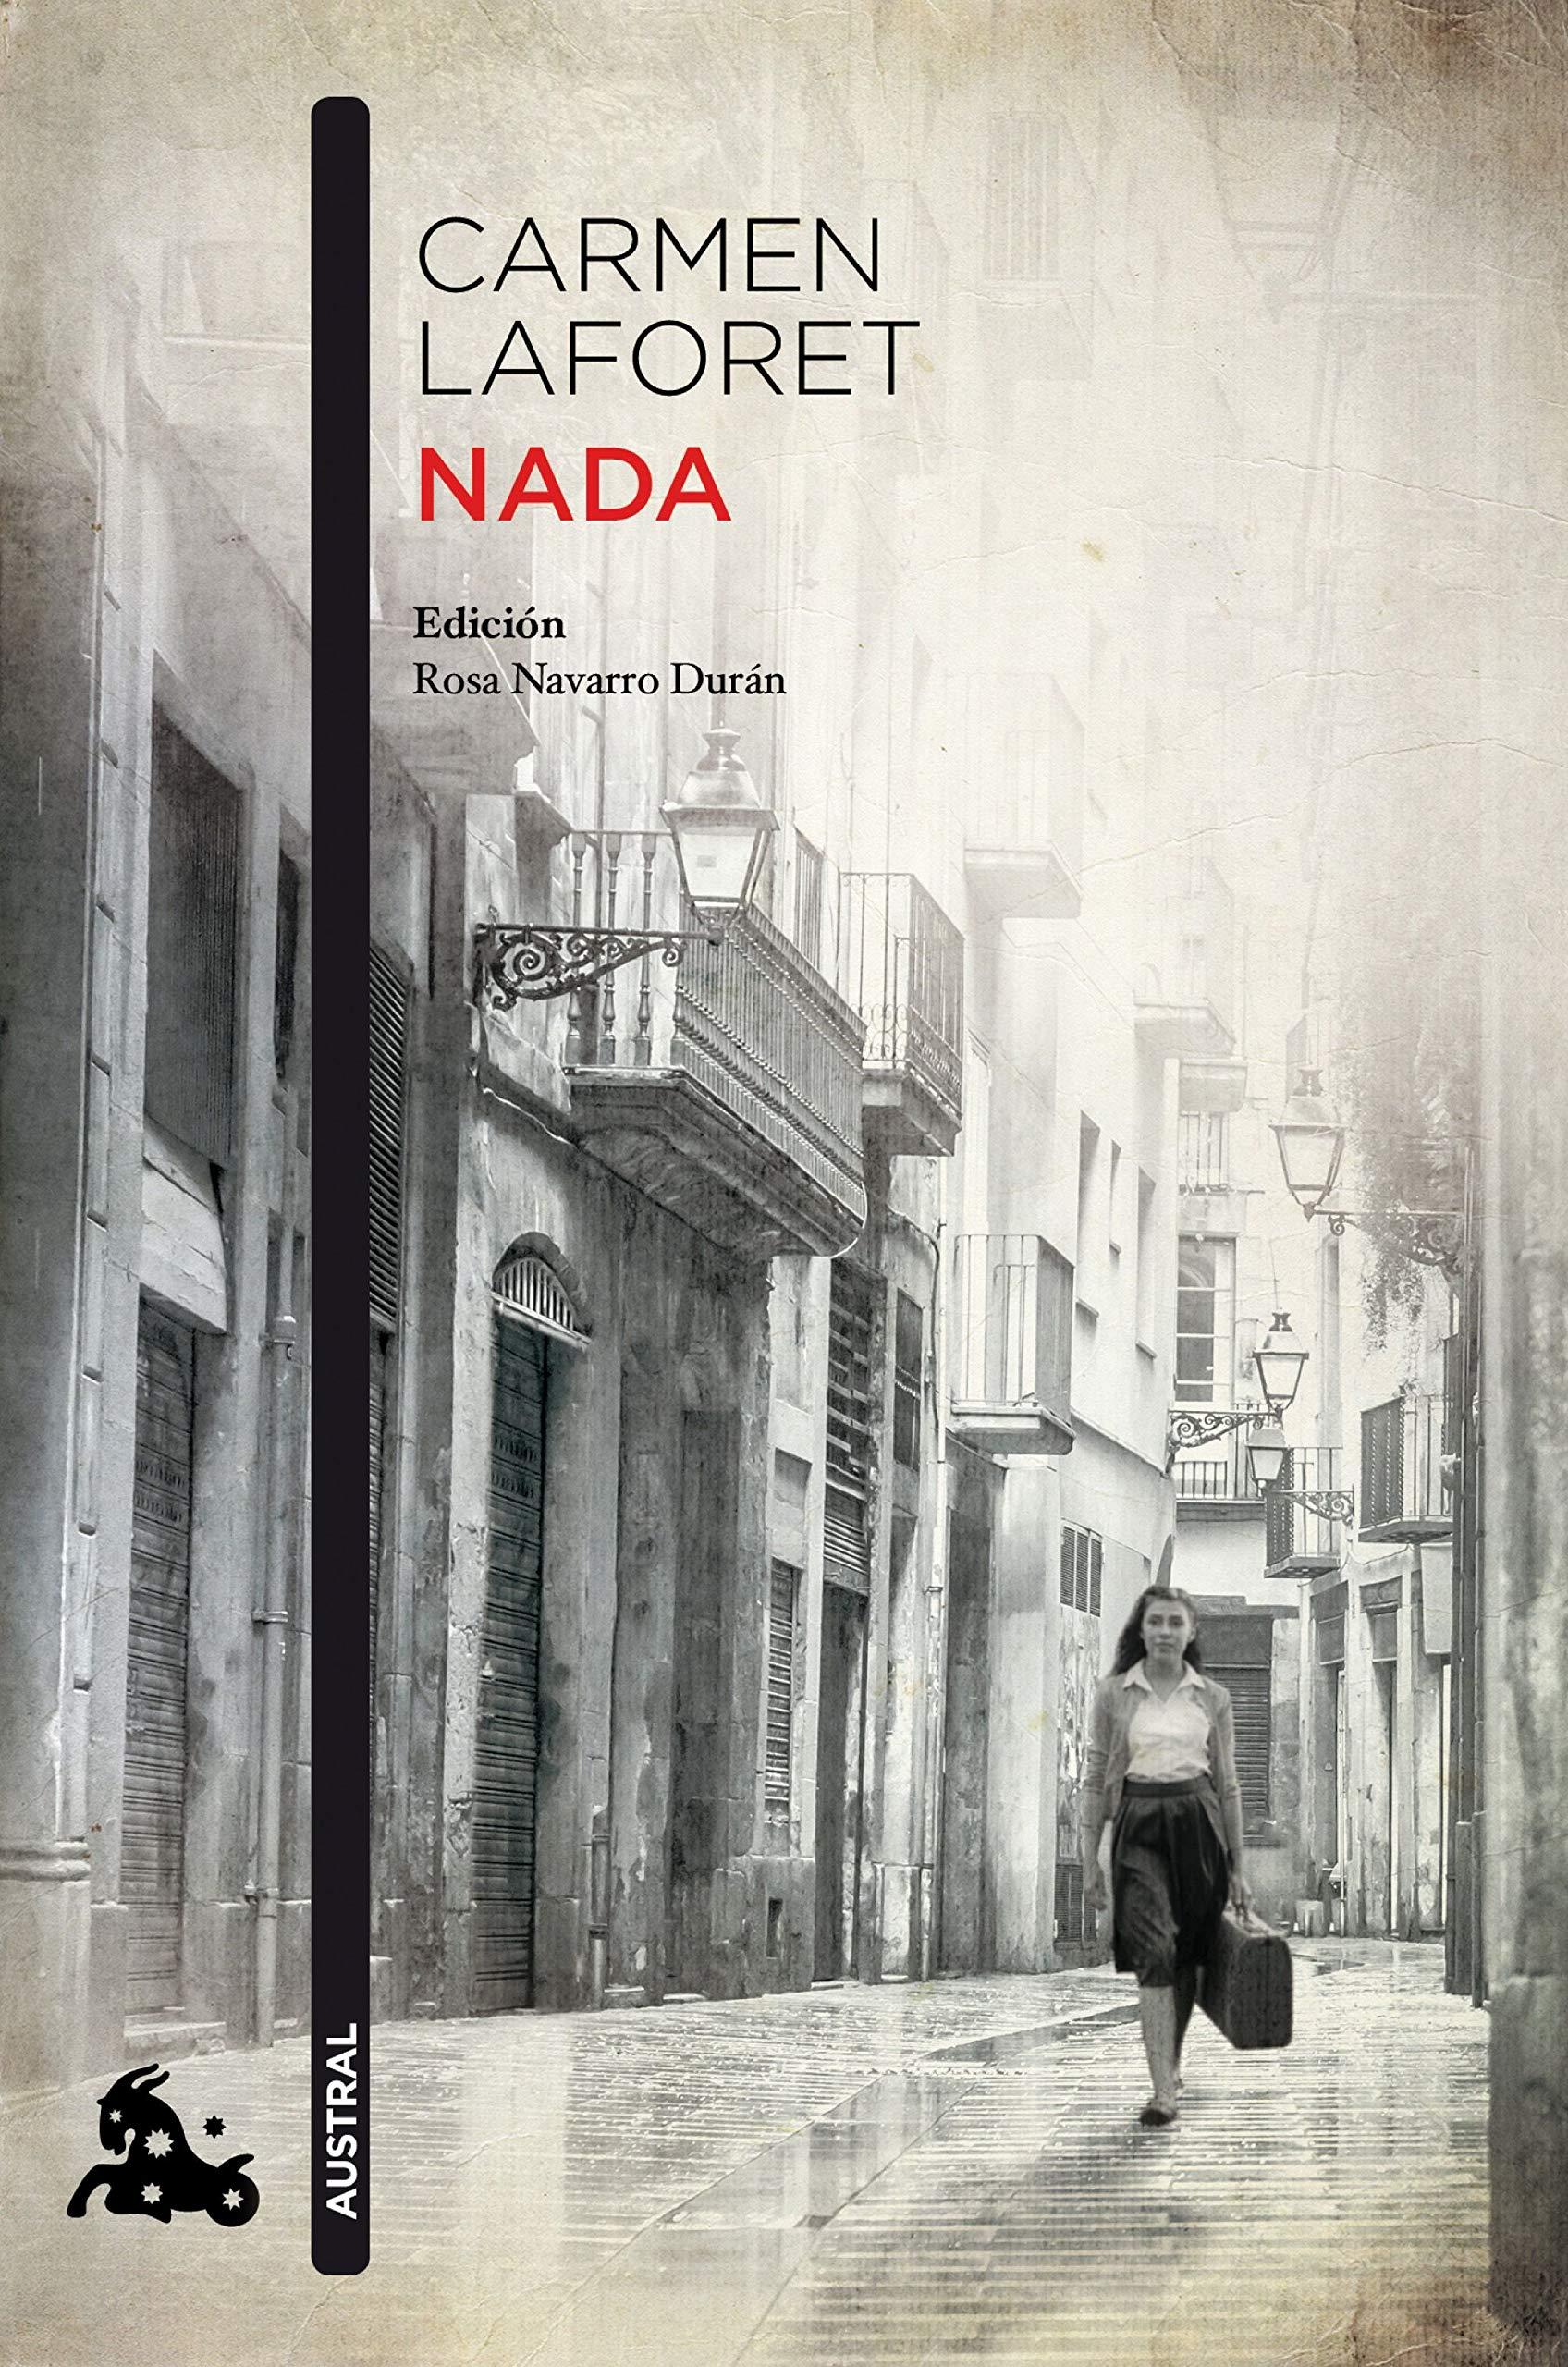 Carmen Laforet: la biografía de la autora de Nada